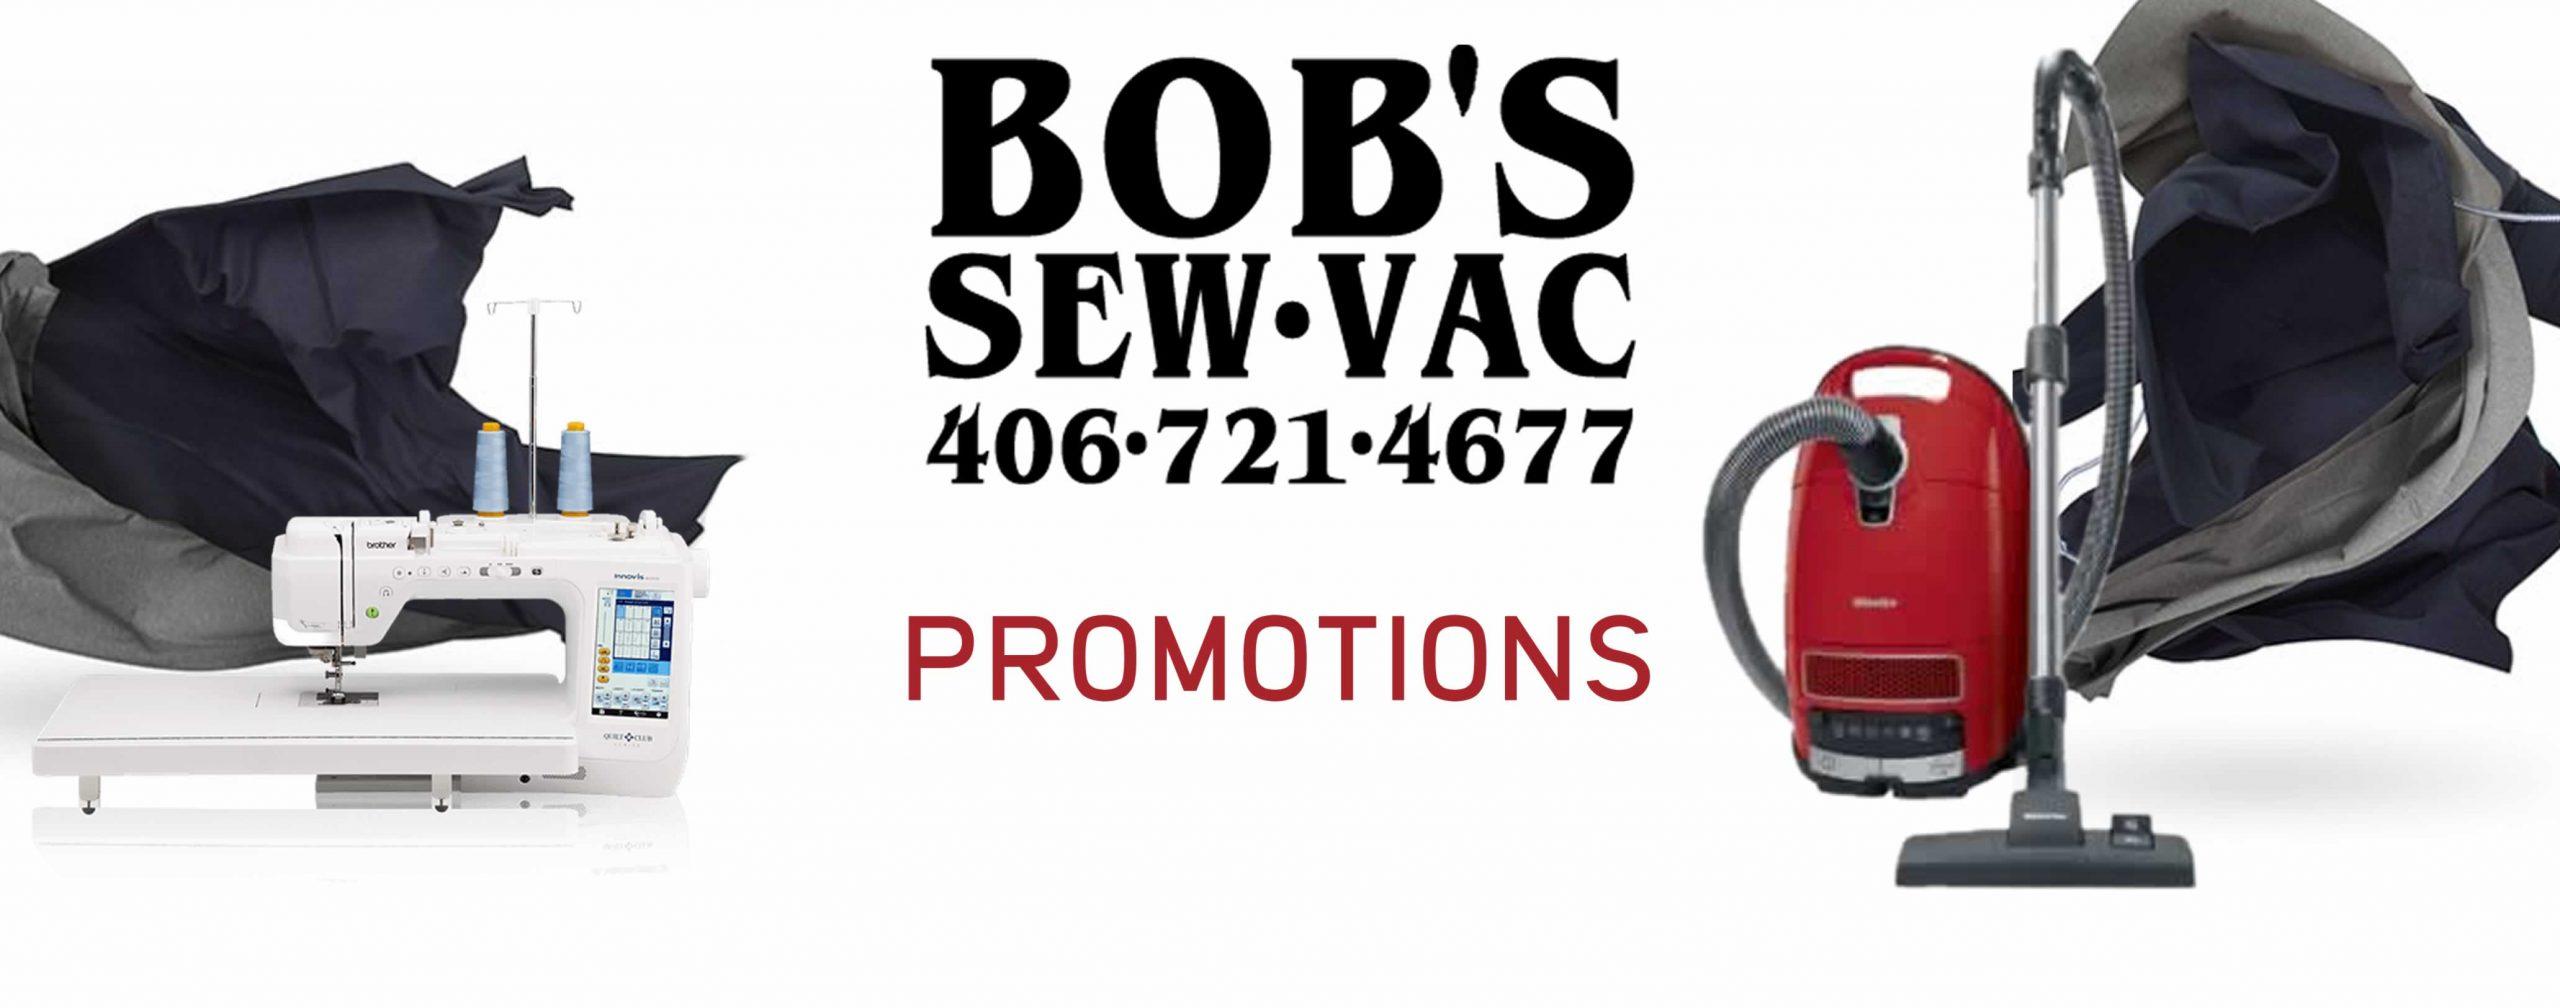 Bob's Sew & Vac Center Promotions